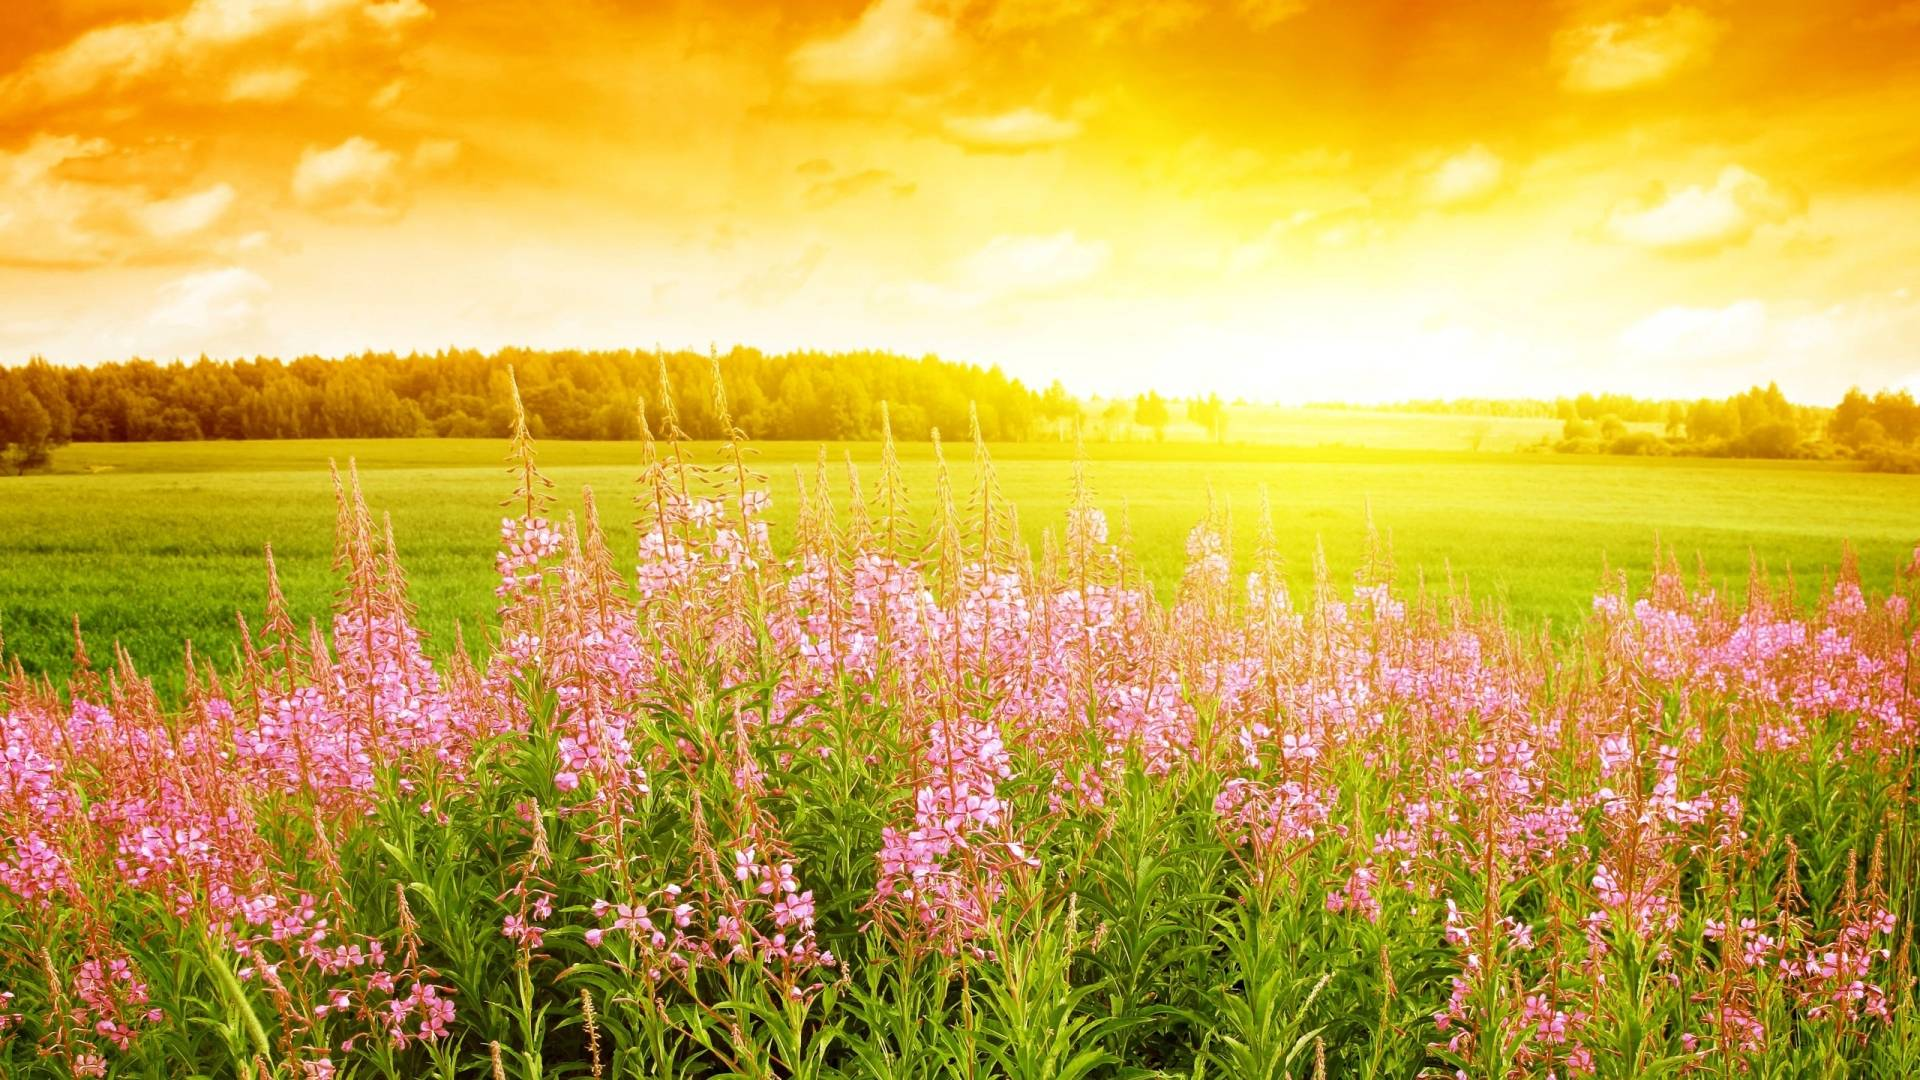 Beautiful Summer Backgrounds 1920x1080